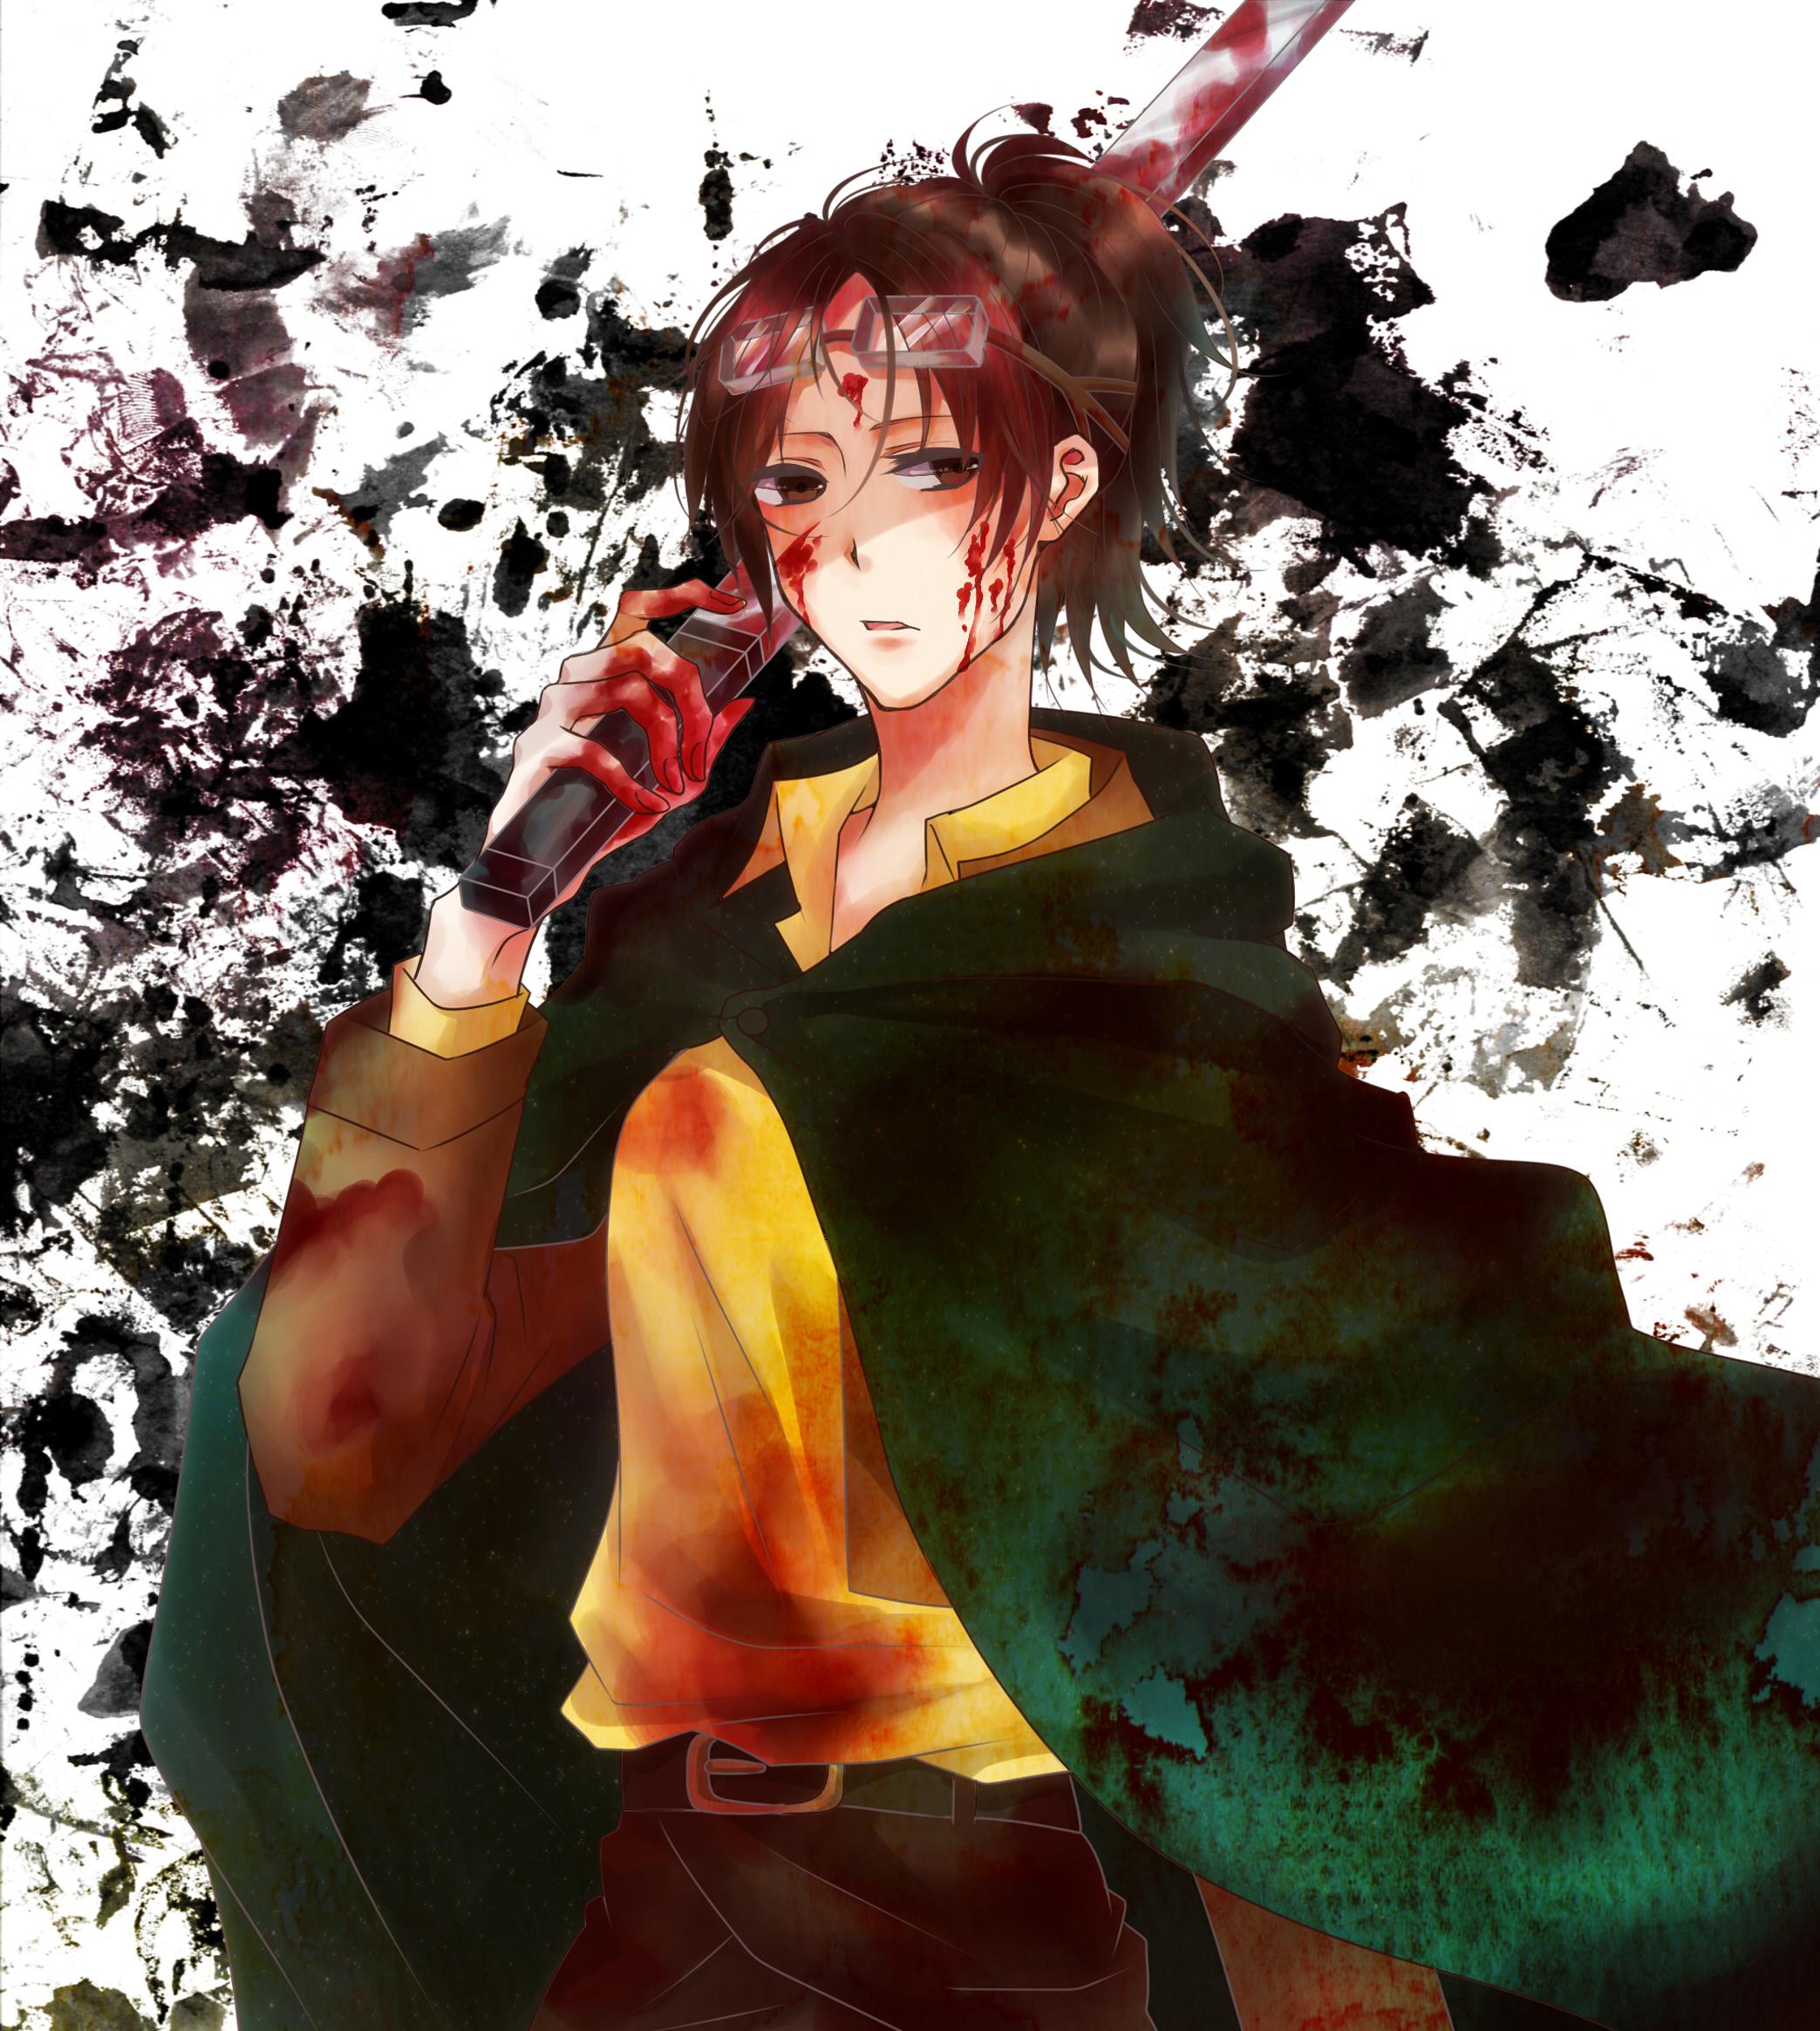 Hange Zoe Hanji Zoe Attack On Titan Image 1649549 Zerochan Anime Image Board